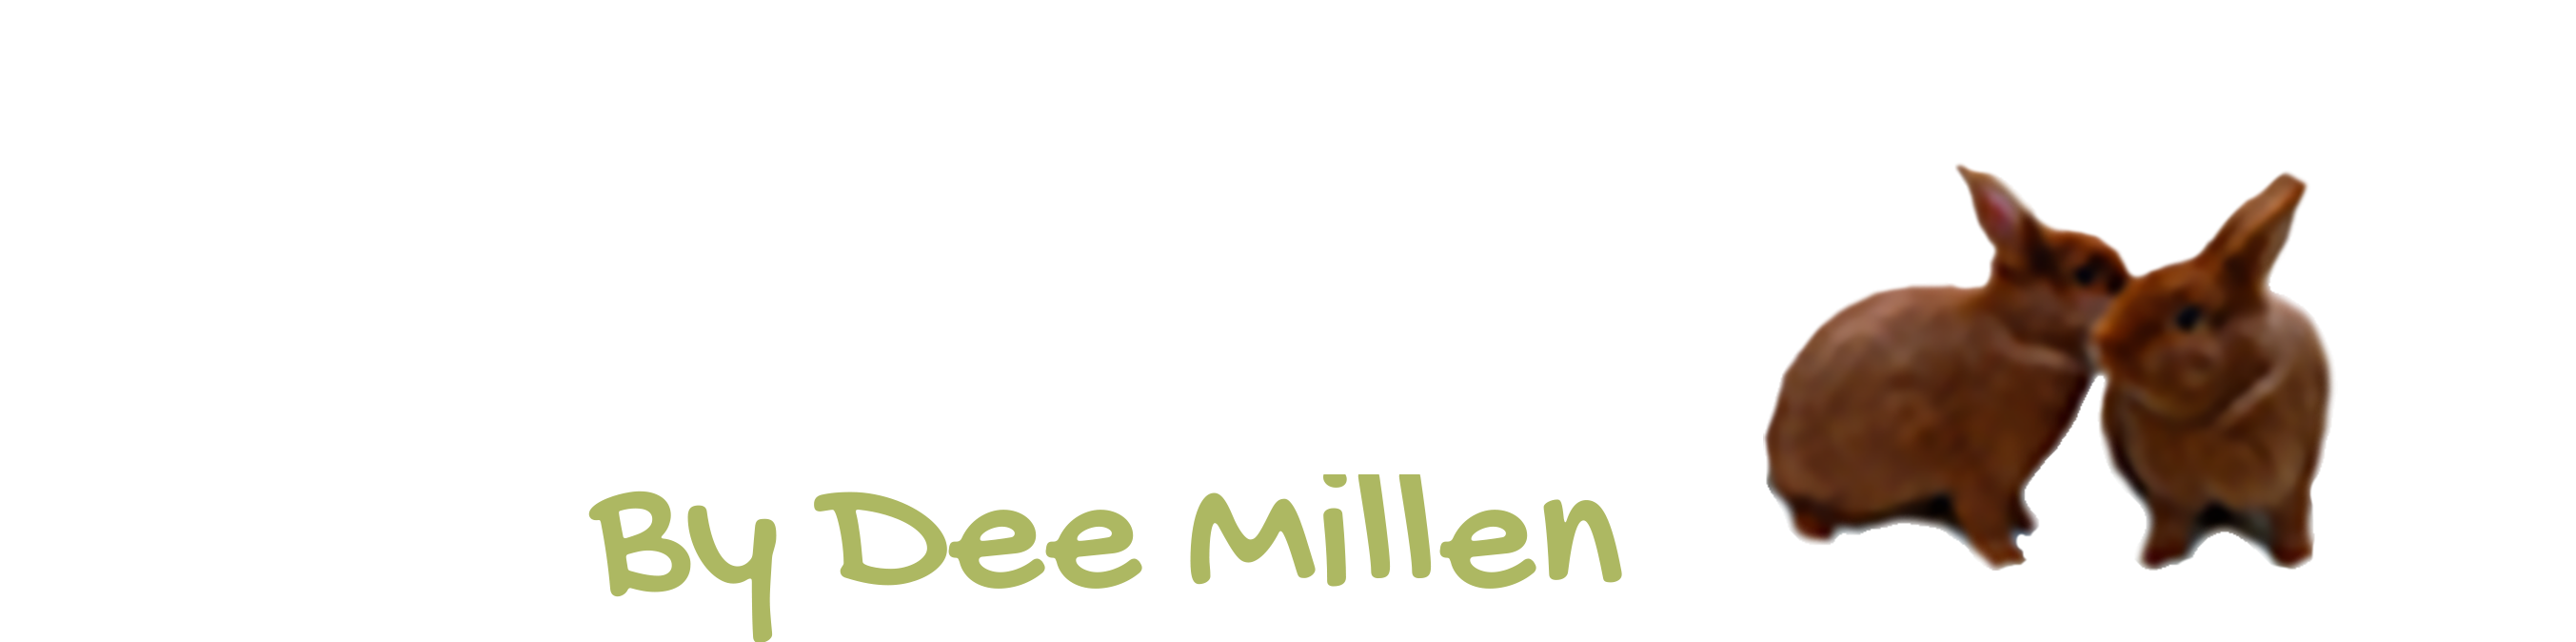 Rabbit Mad by Dee Millen